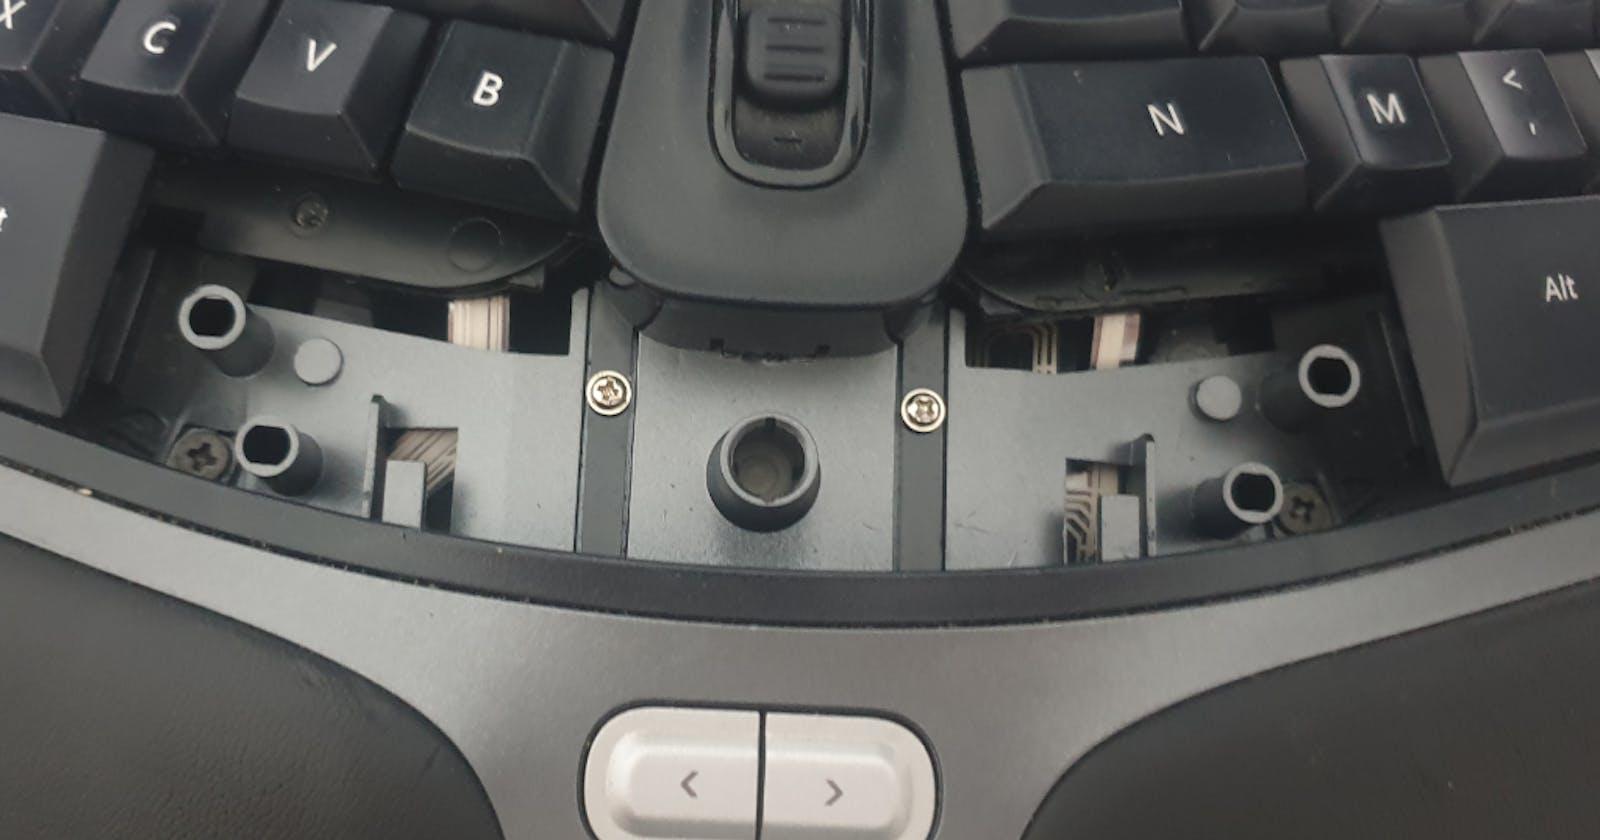 How to fix the noisy spacebar on the Microsoft Ergonomic Keyboard 4000